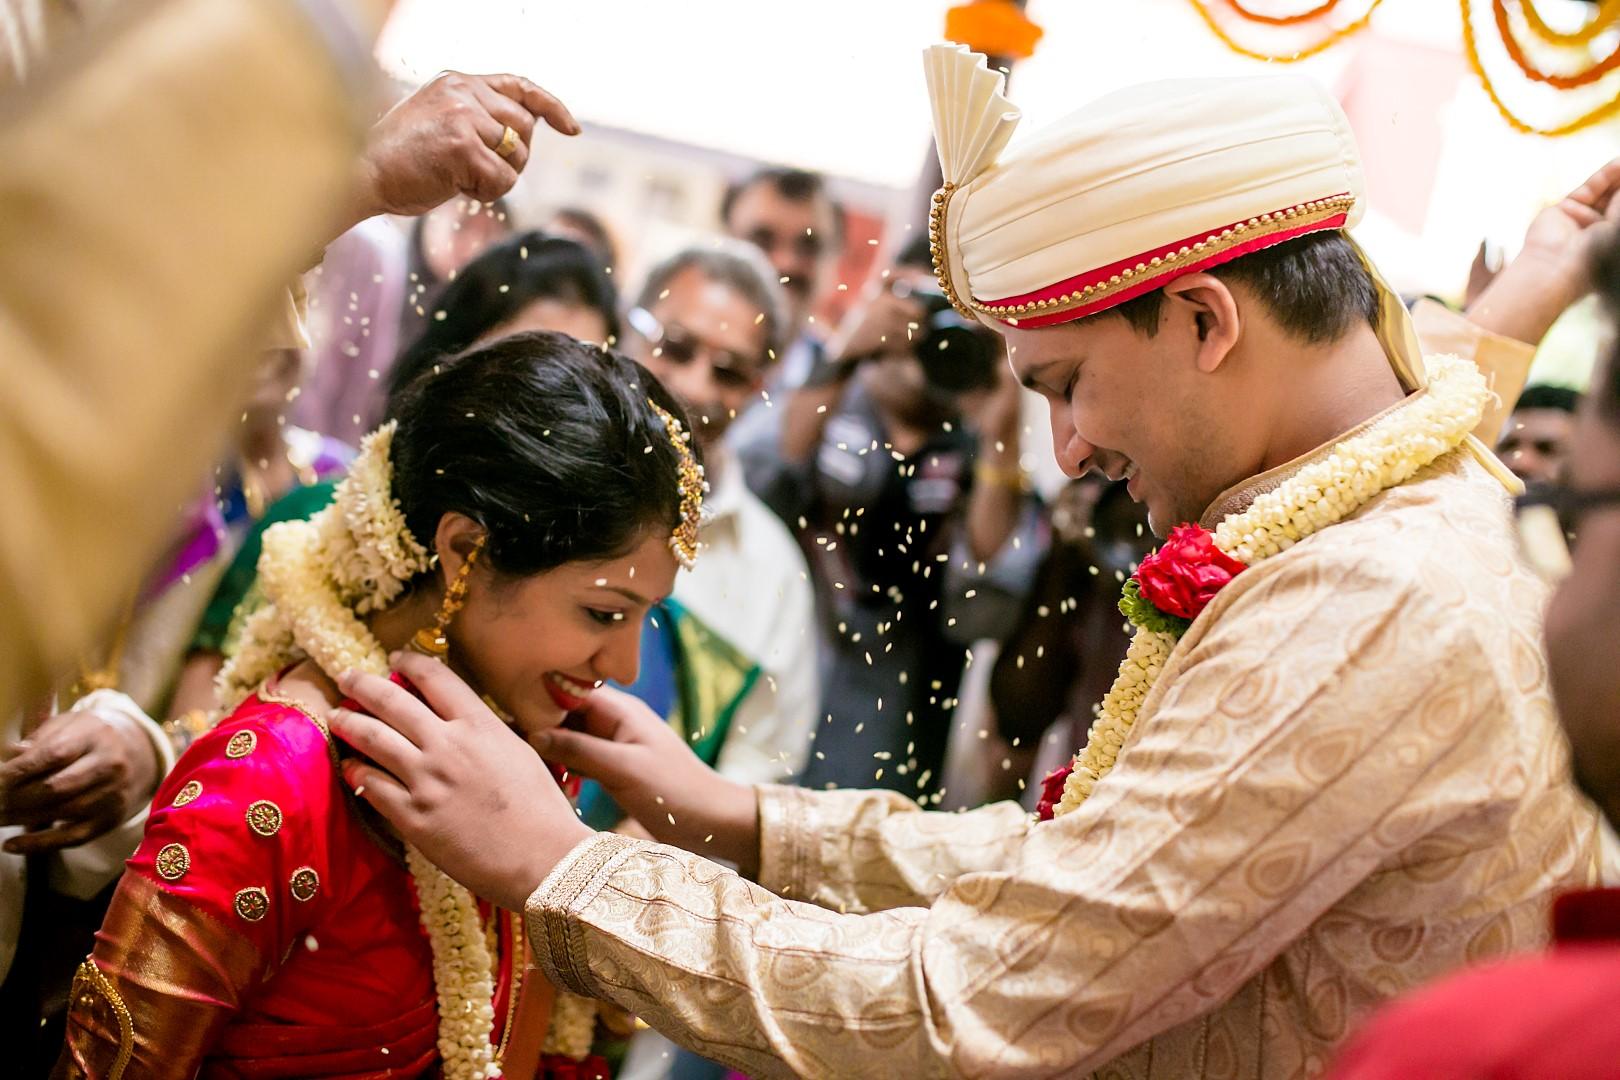 Kee & Rajiv - A Courtyard Wedding @ Shibravyi